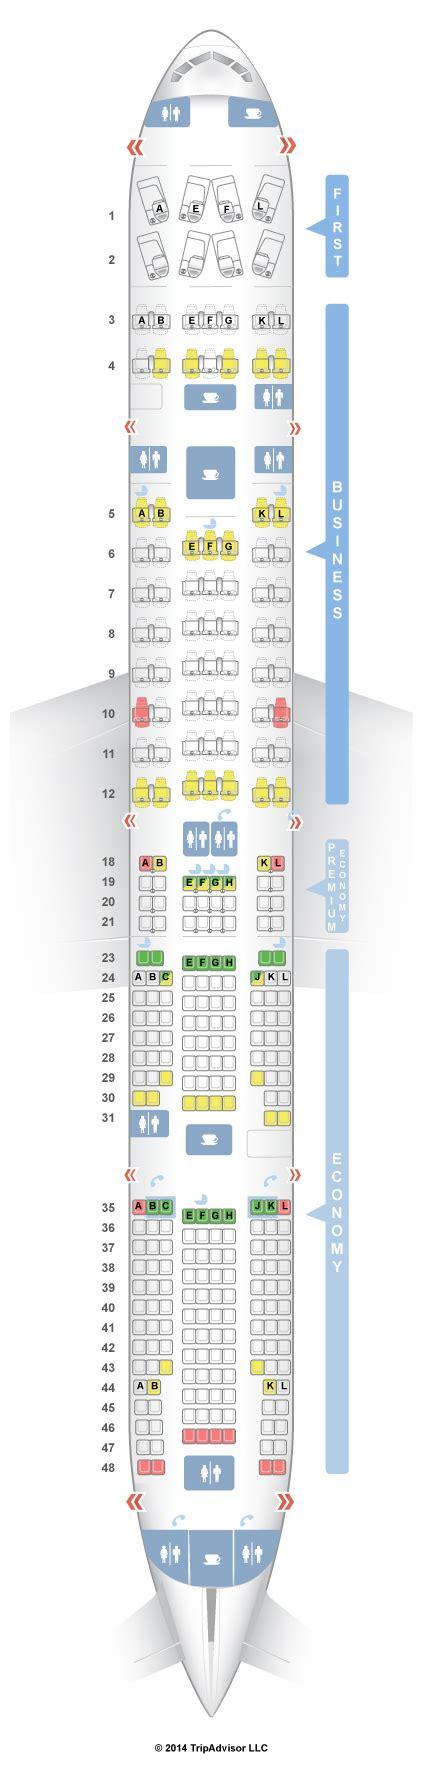 plan siege boeing 777 300er seatguru seat map air boeing 777 300er 77w four